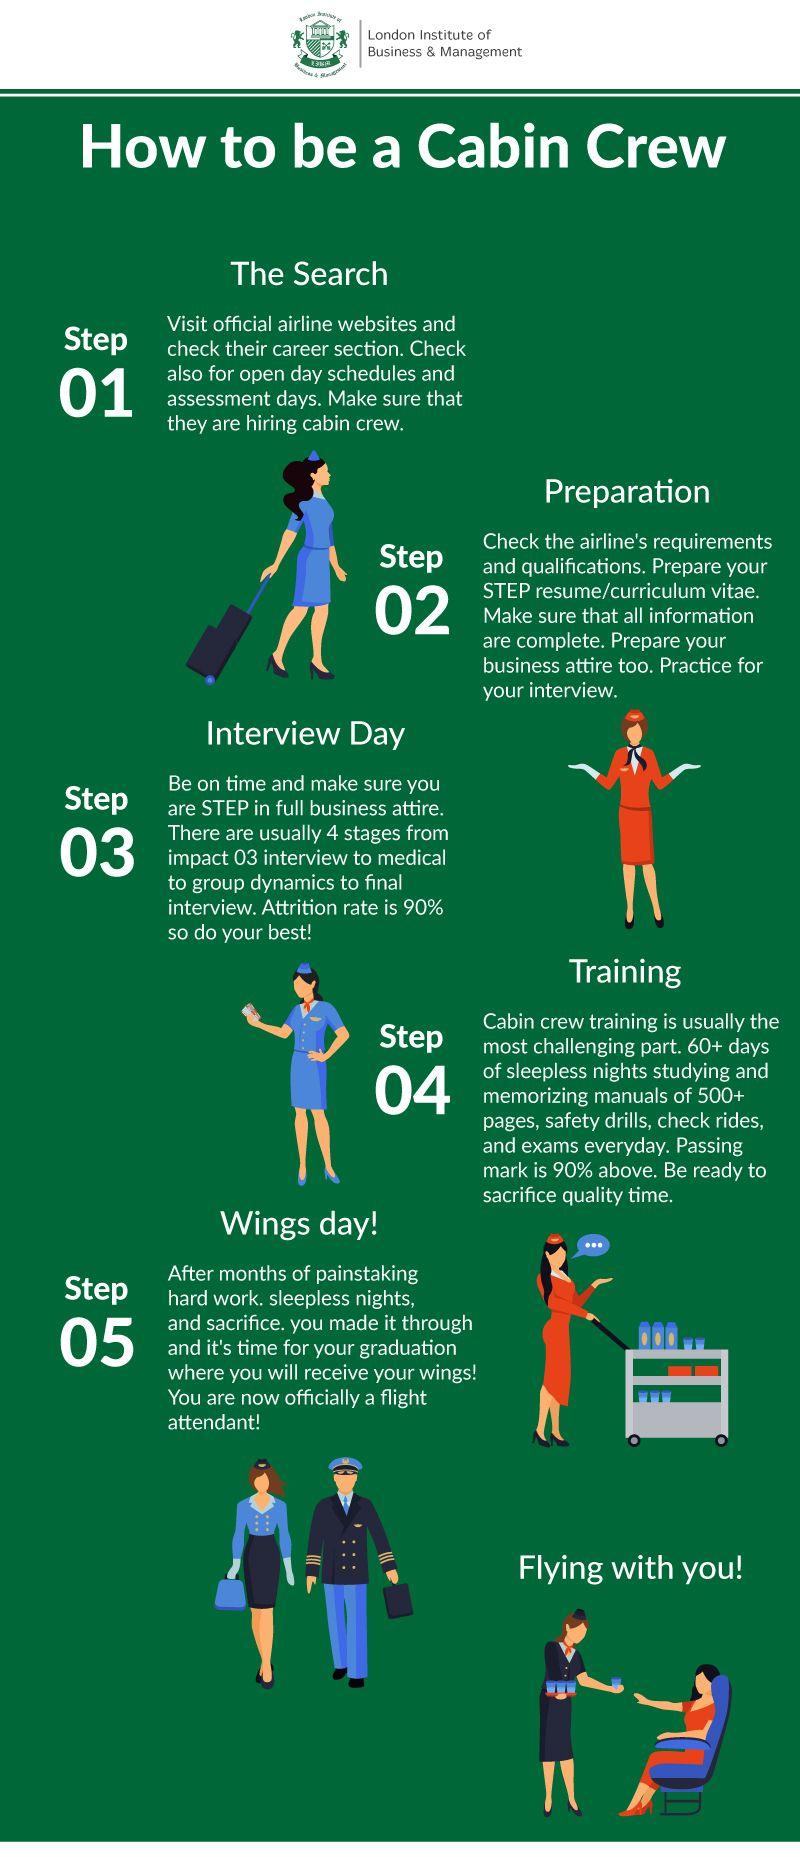 Cabin Crew Training Course in 2020 Cabin crew, Cabin